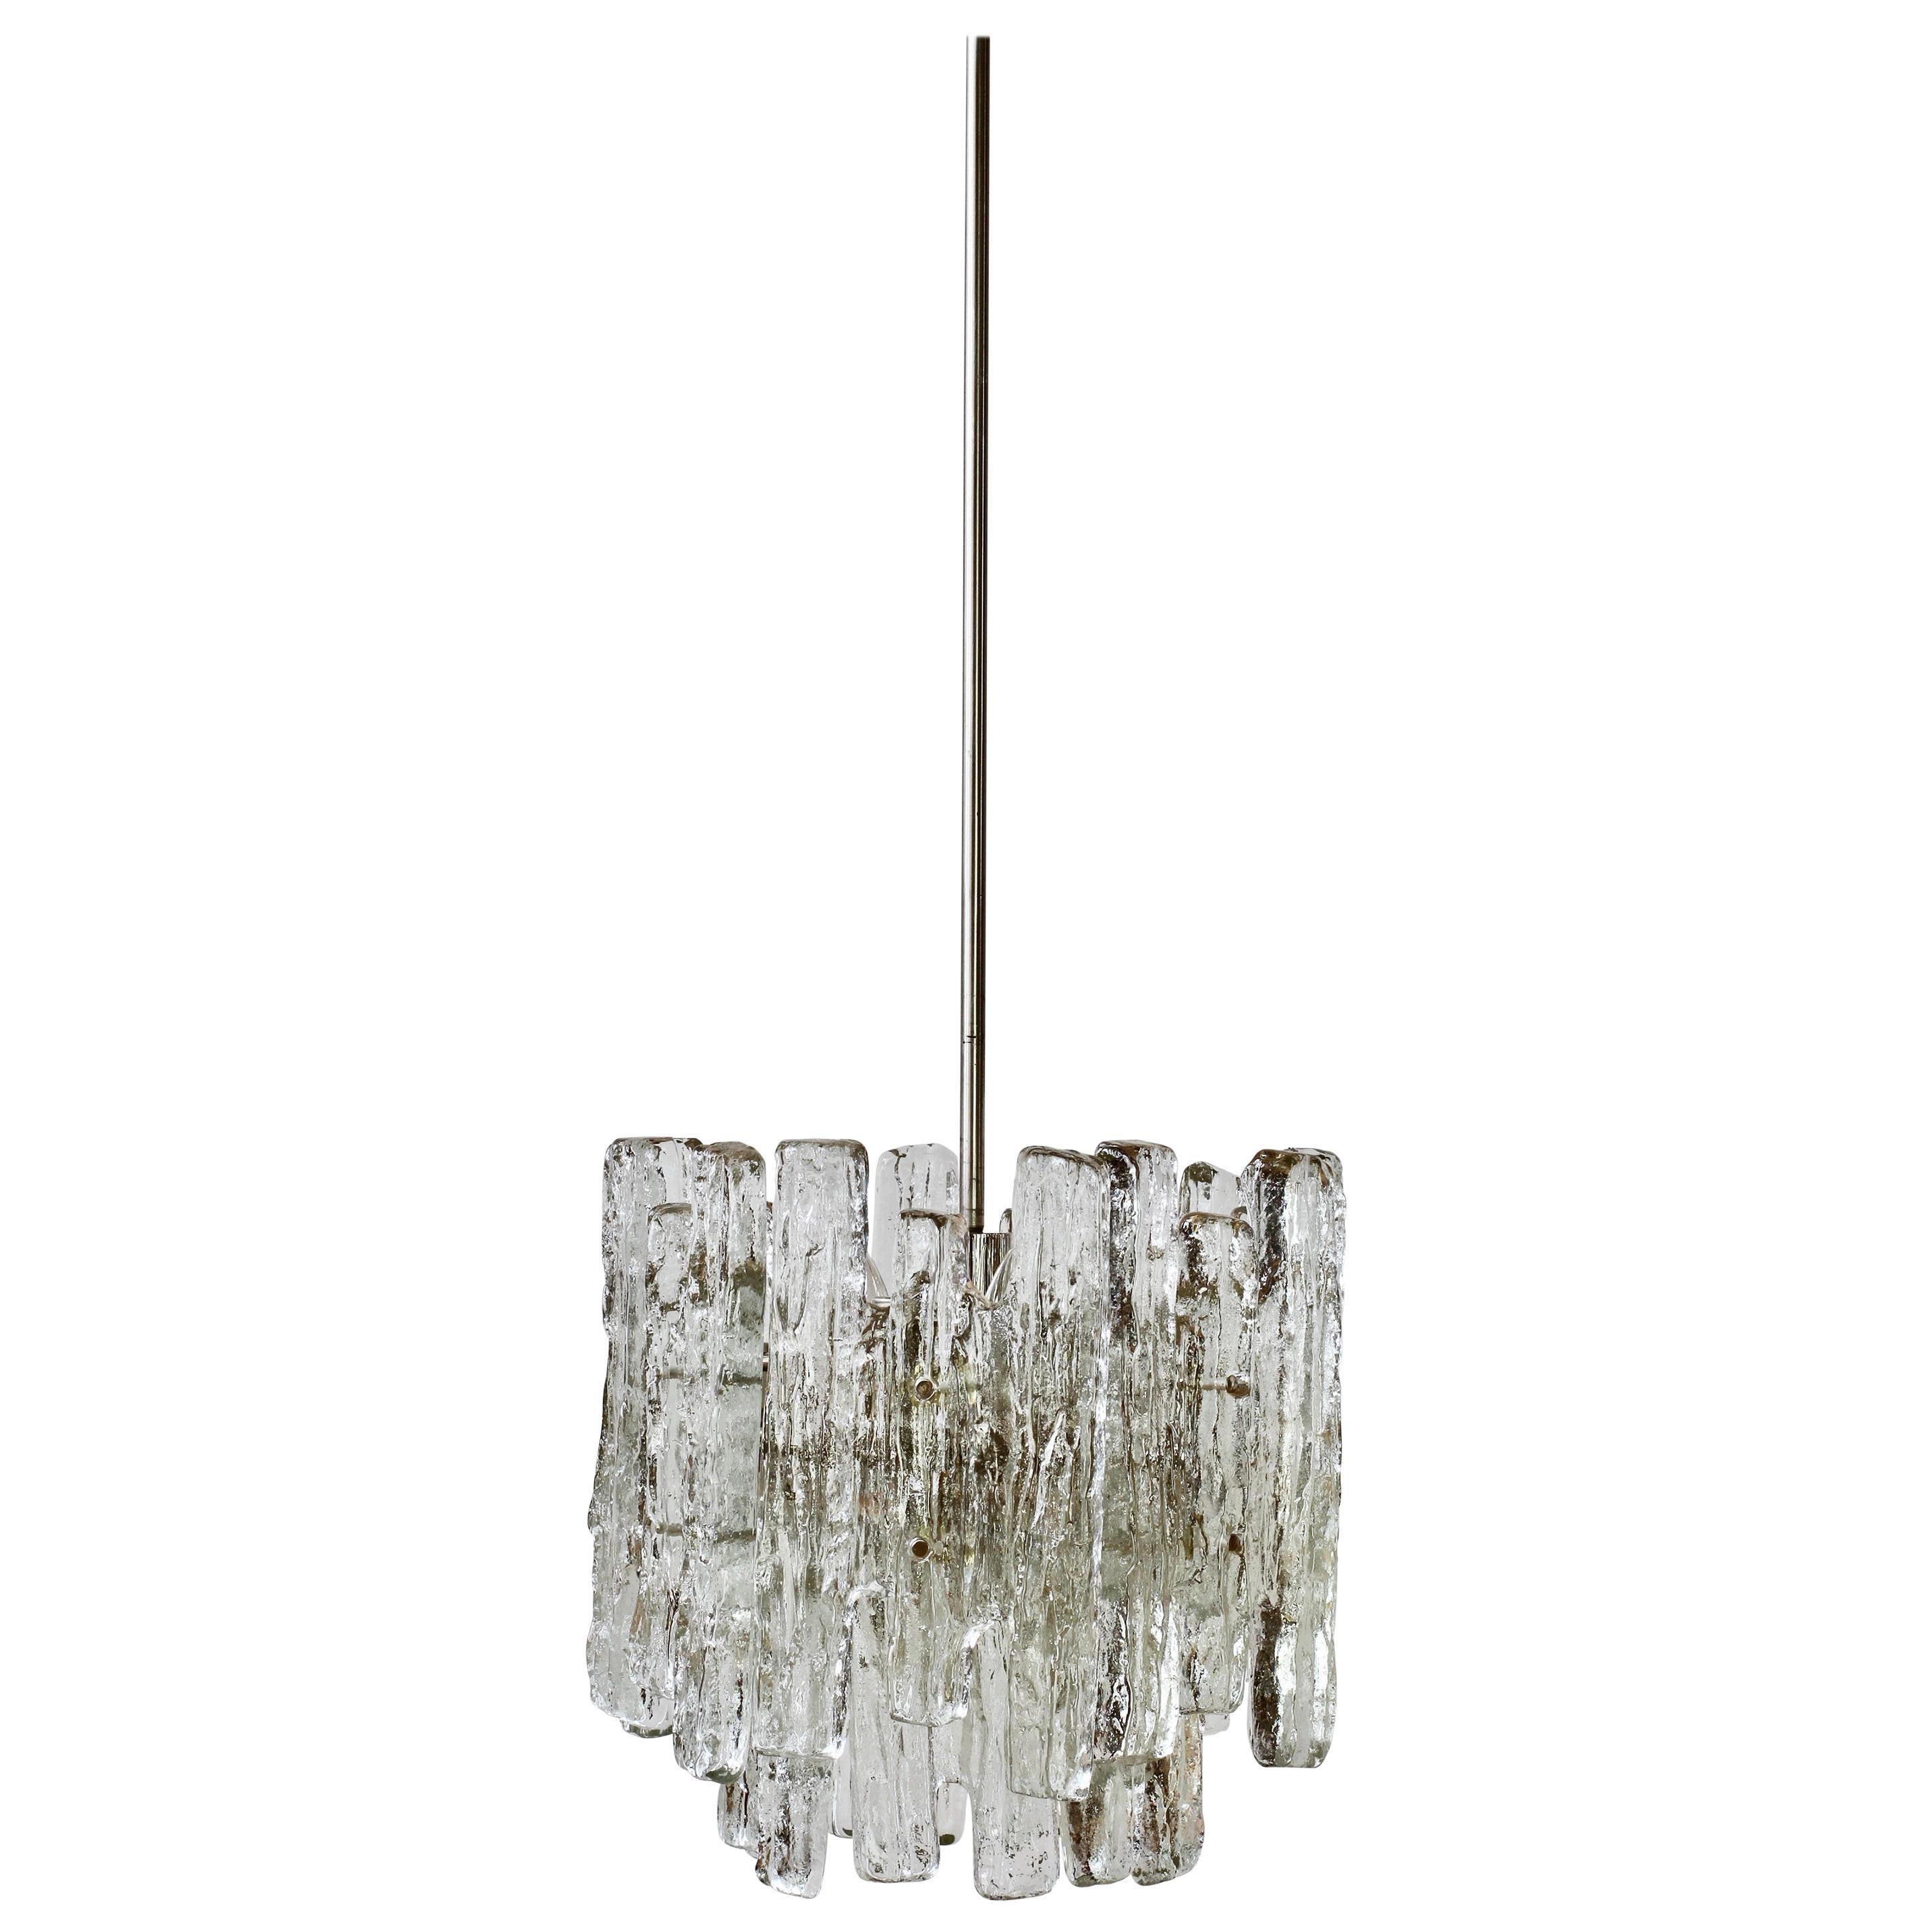 1 of 4 Mid-Century Kalmar Ice Crystal Glass Pendant Lights or Chandeliers